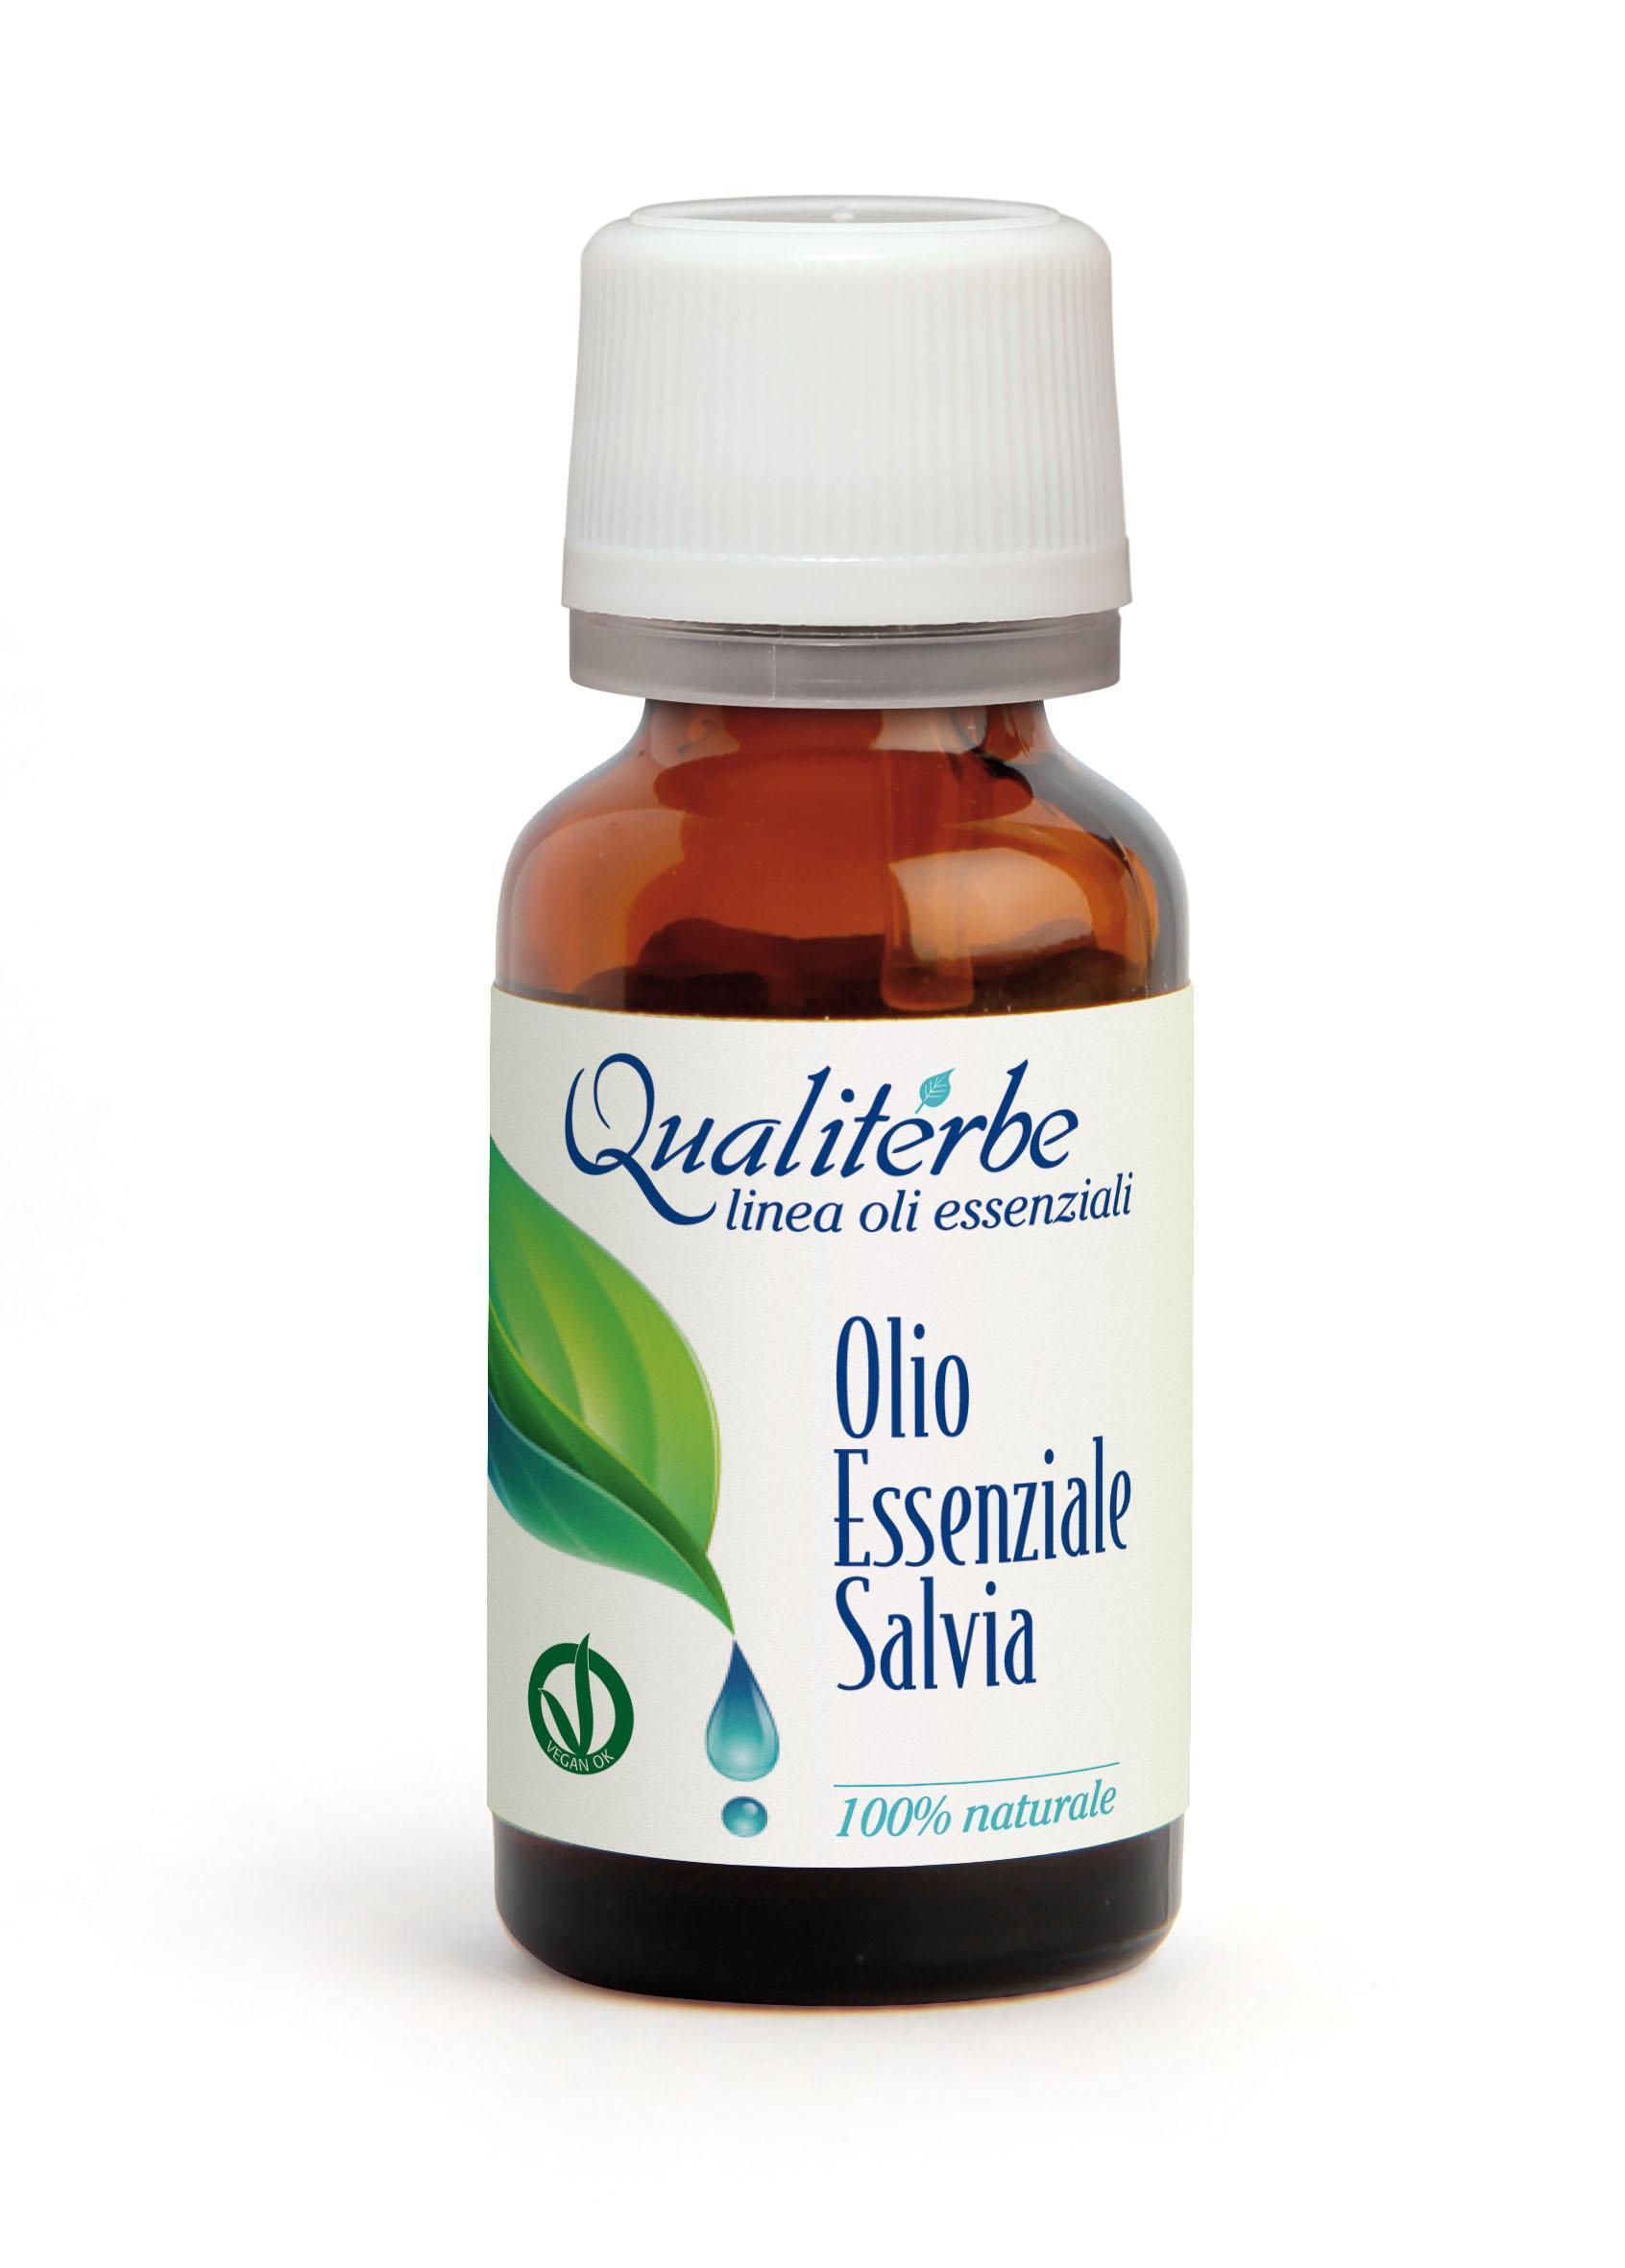 OLio essenziale di Salvia 10 ml (Vegan Ok)